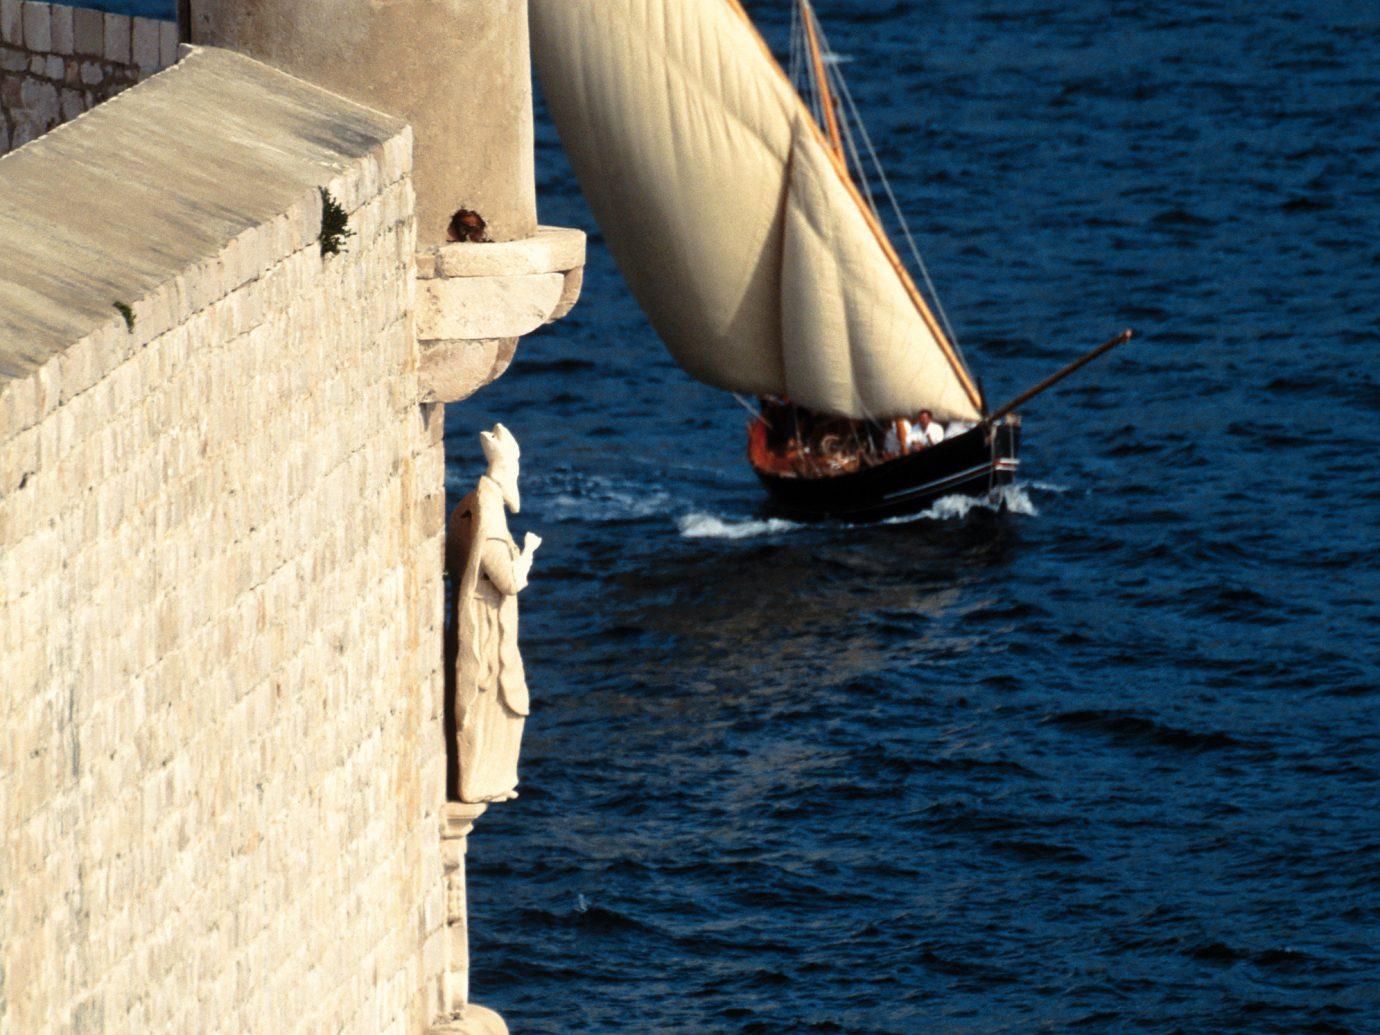 Offbeat water outdoor vehicle blue Sea Boat tower Ocean sail watercraft Coast sailing ship mast sailboat sailing vessel